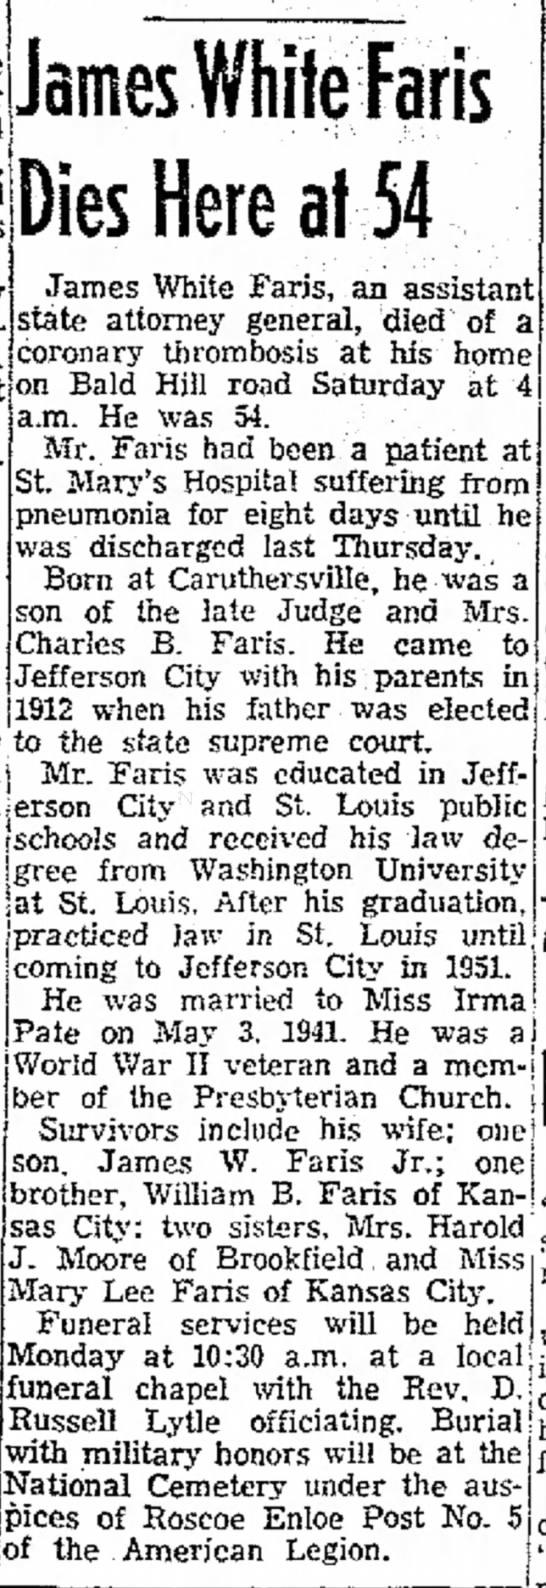 James White Faris Dies Here at 54 (1958) -